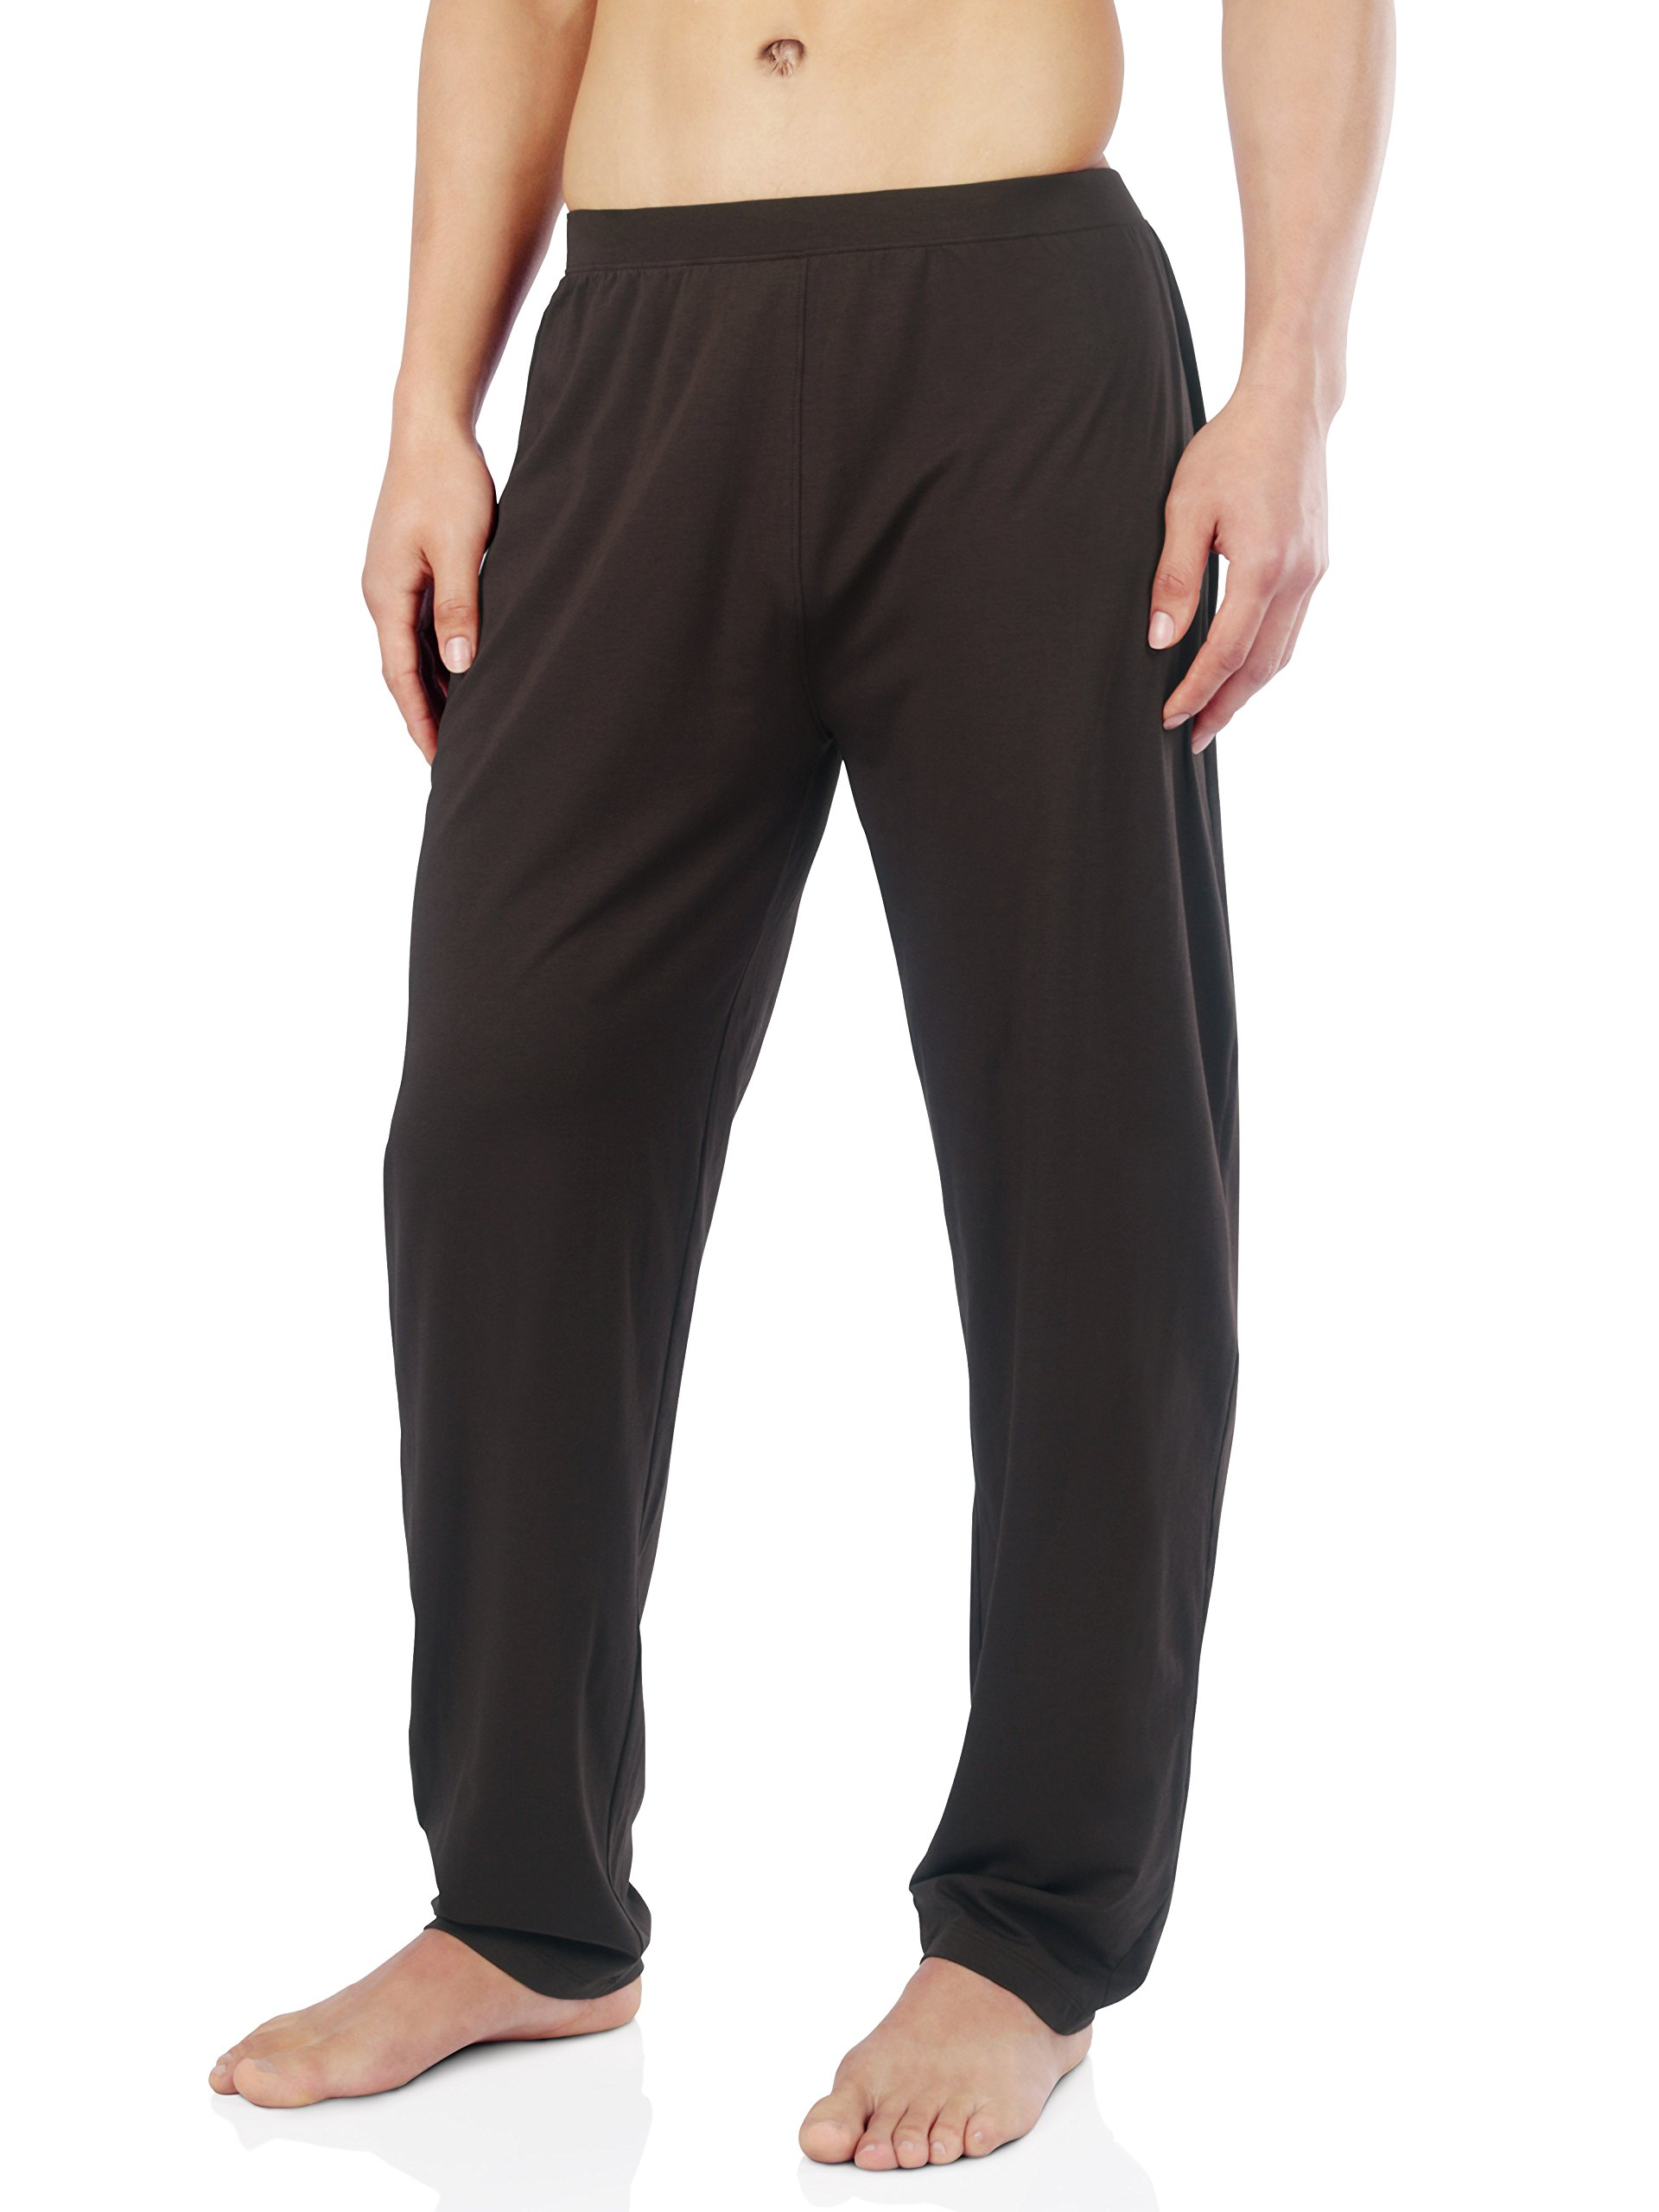 David Archy Men's Soft Cotton Jersey Knit Pajama Pants (M, Brown)